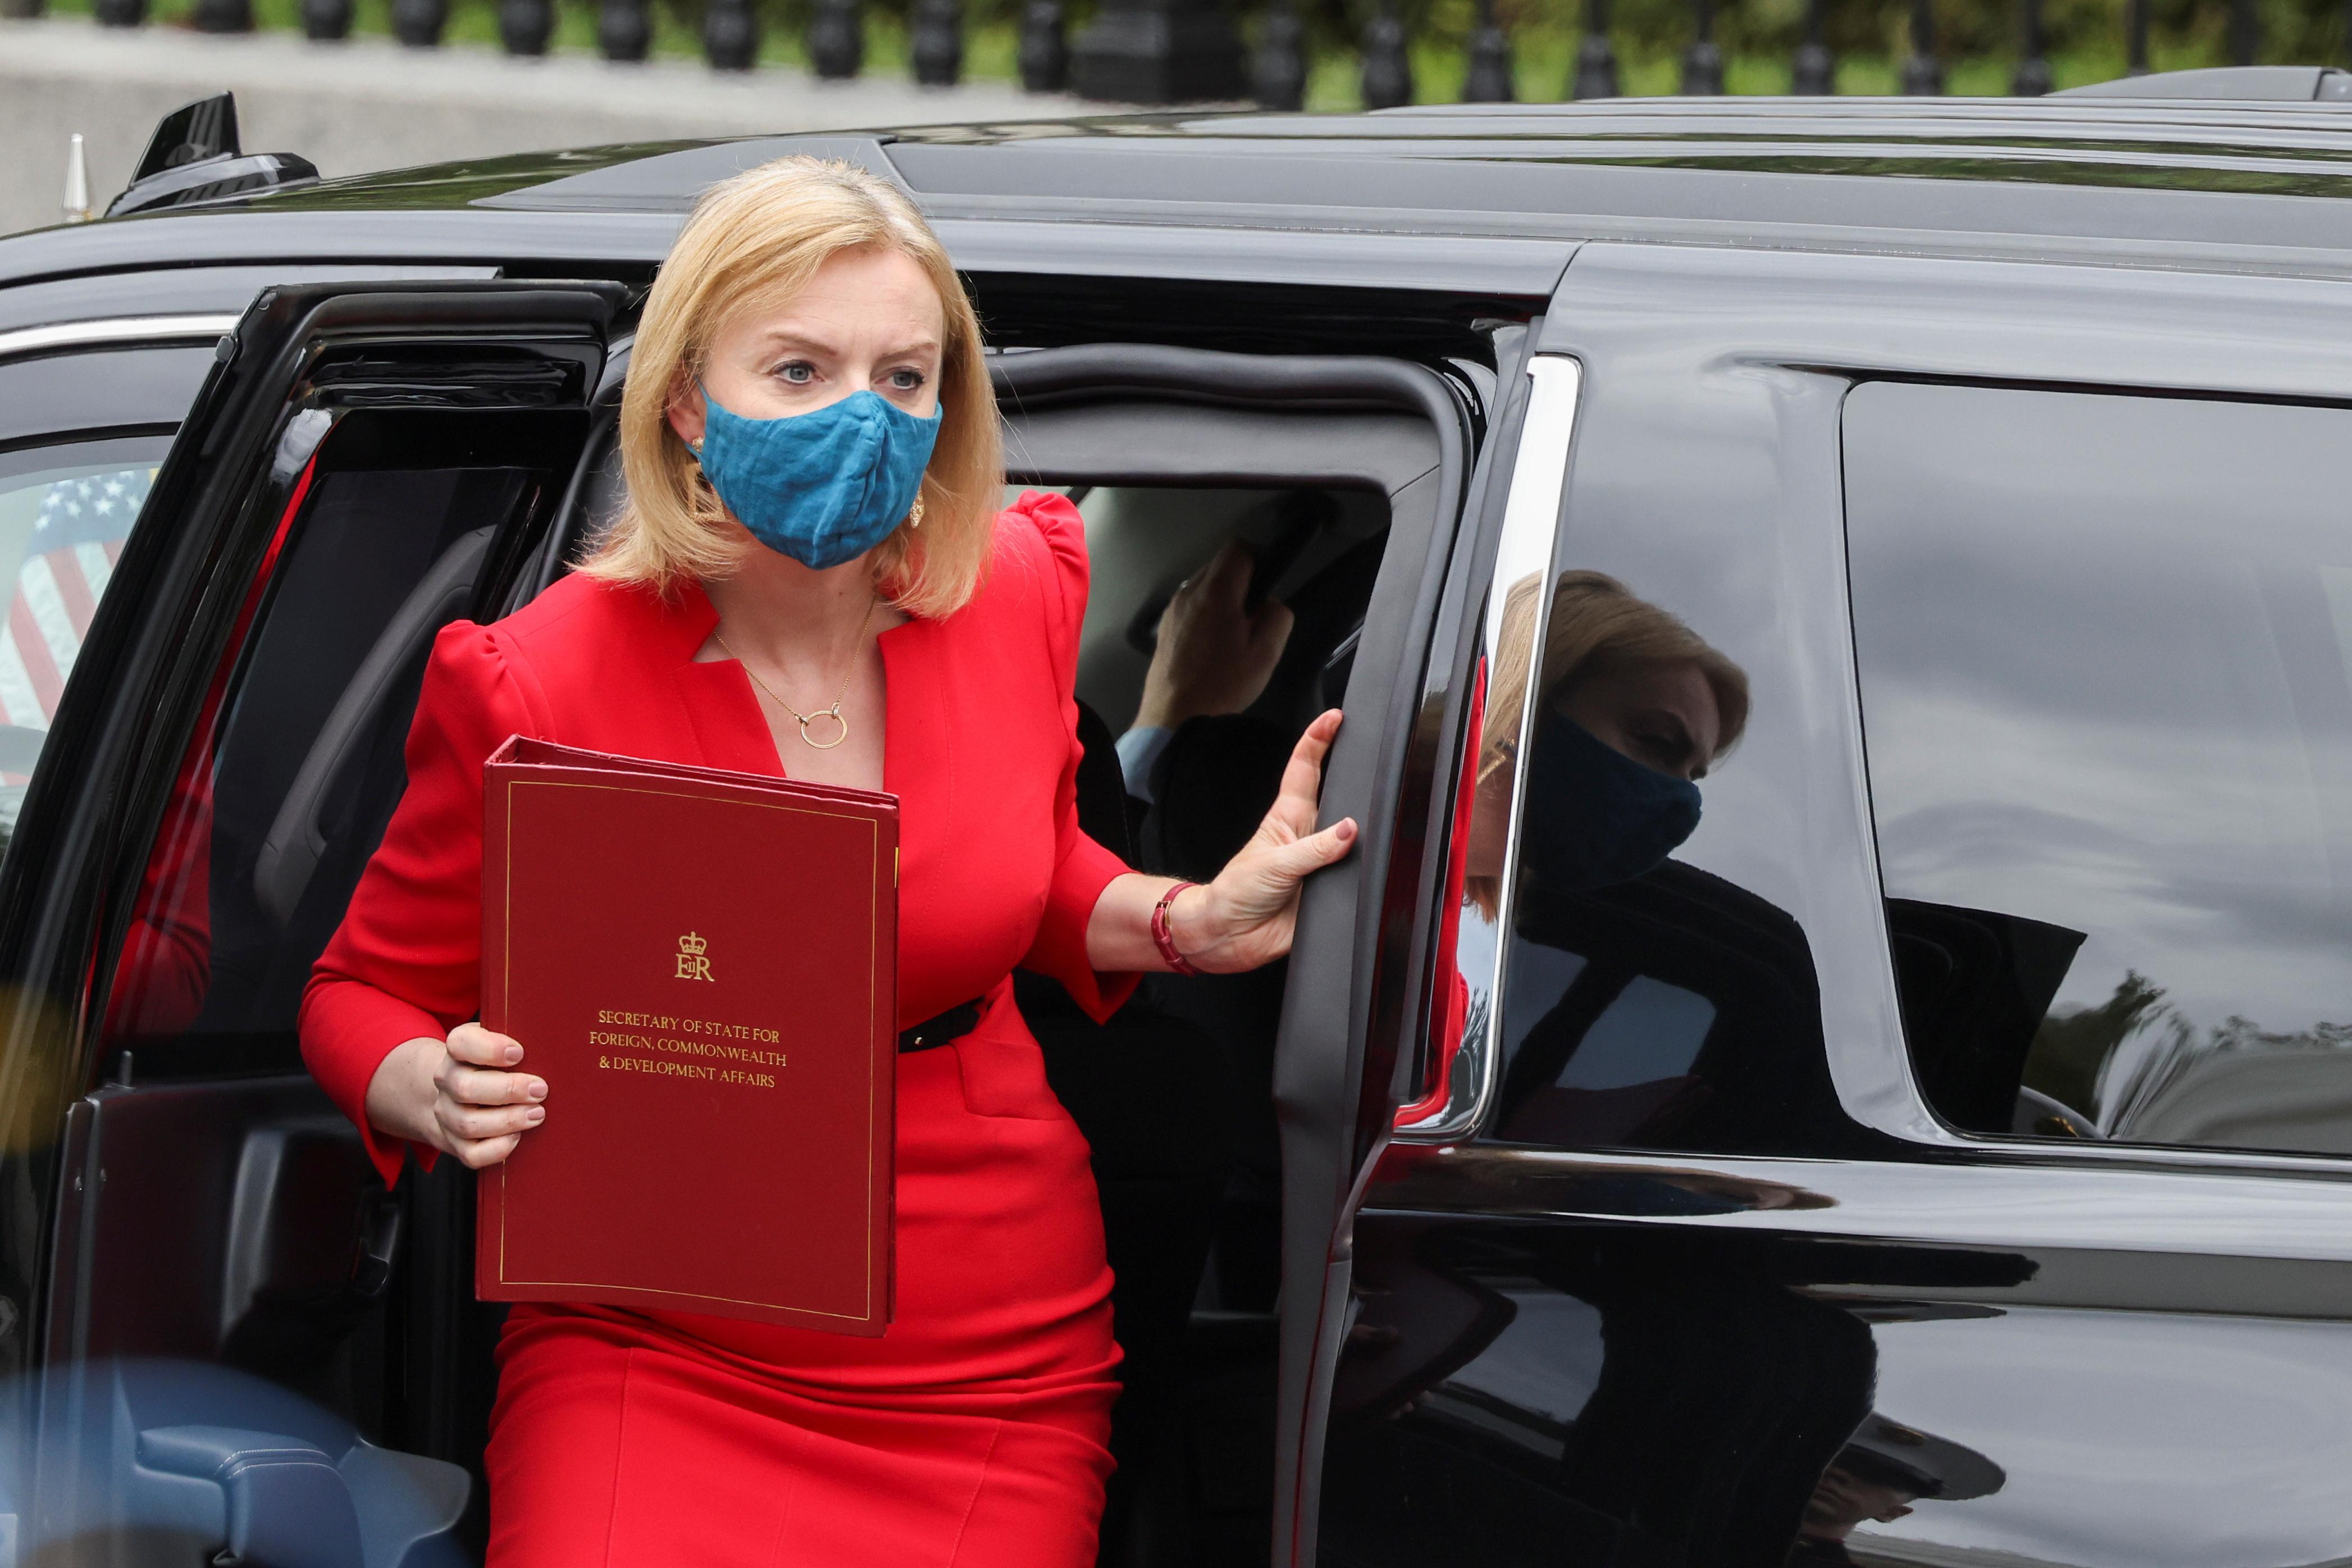 British Foreign Secretary Elizabeth Truss arrives at the White House in Washington, U.S., September 21, 2021. REUTERS/Evelyn Hockstein